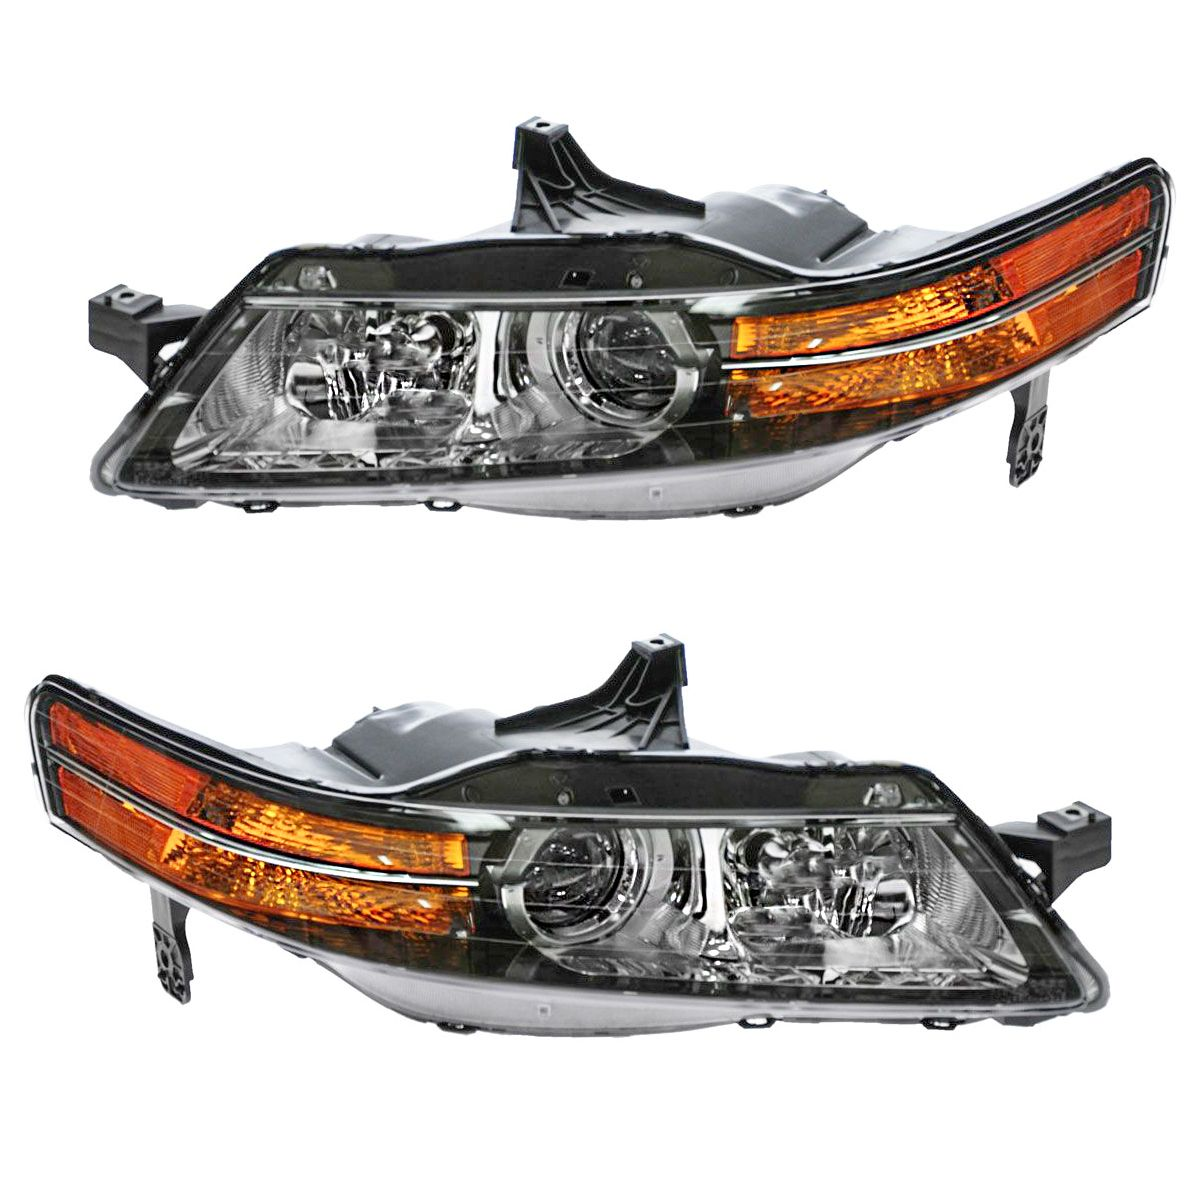 HID Xenon Headlight Headlamp Left & Right Pair Set For 04